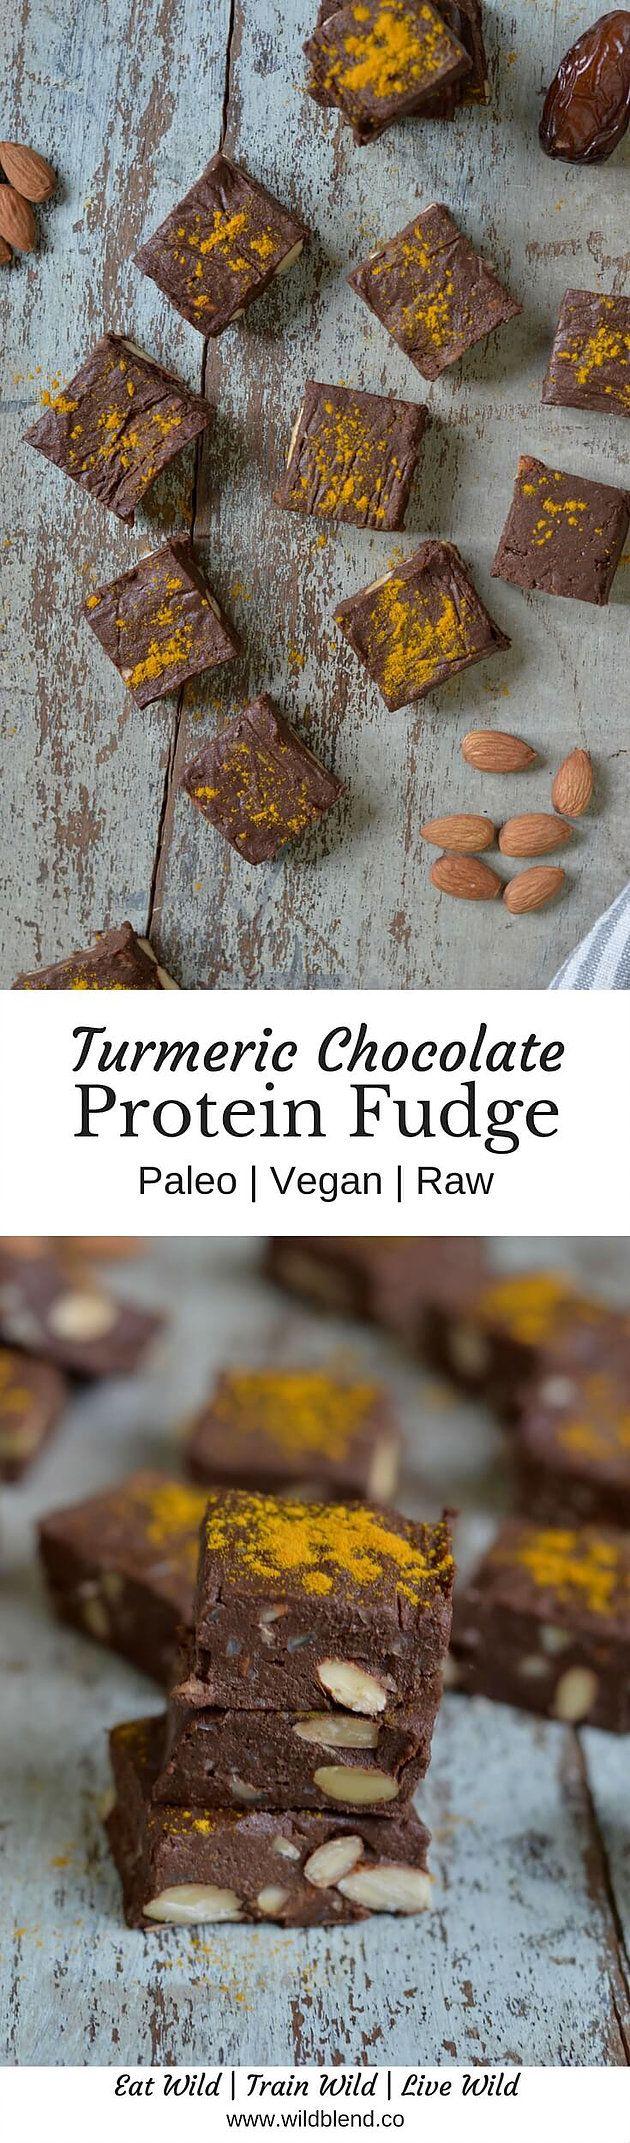 Turmeric Chocolate Protein Fudge   full recipe via http://wildblend.co   Paleo - Vegan - Grain Free - Dairy Free